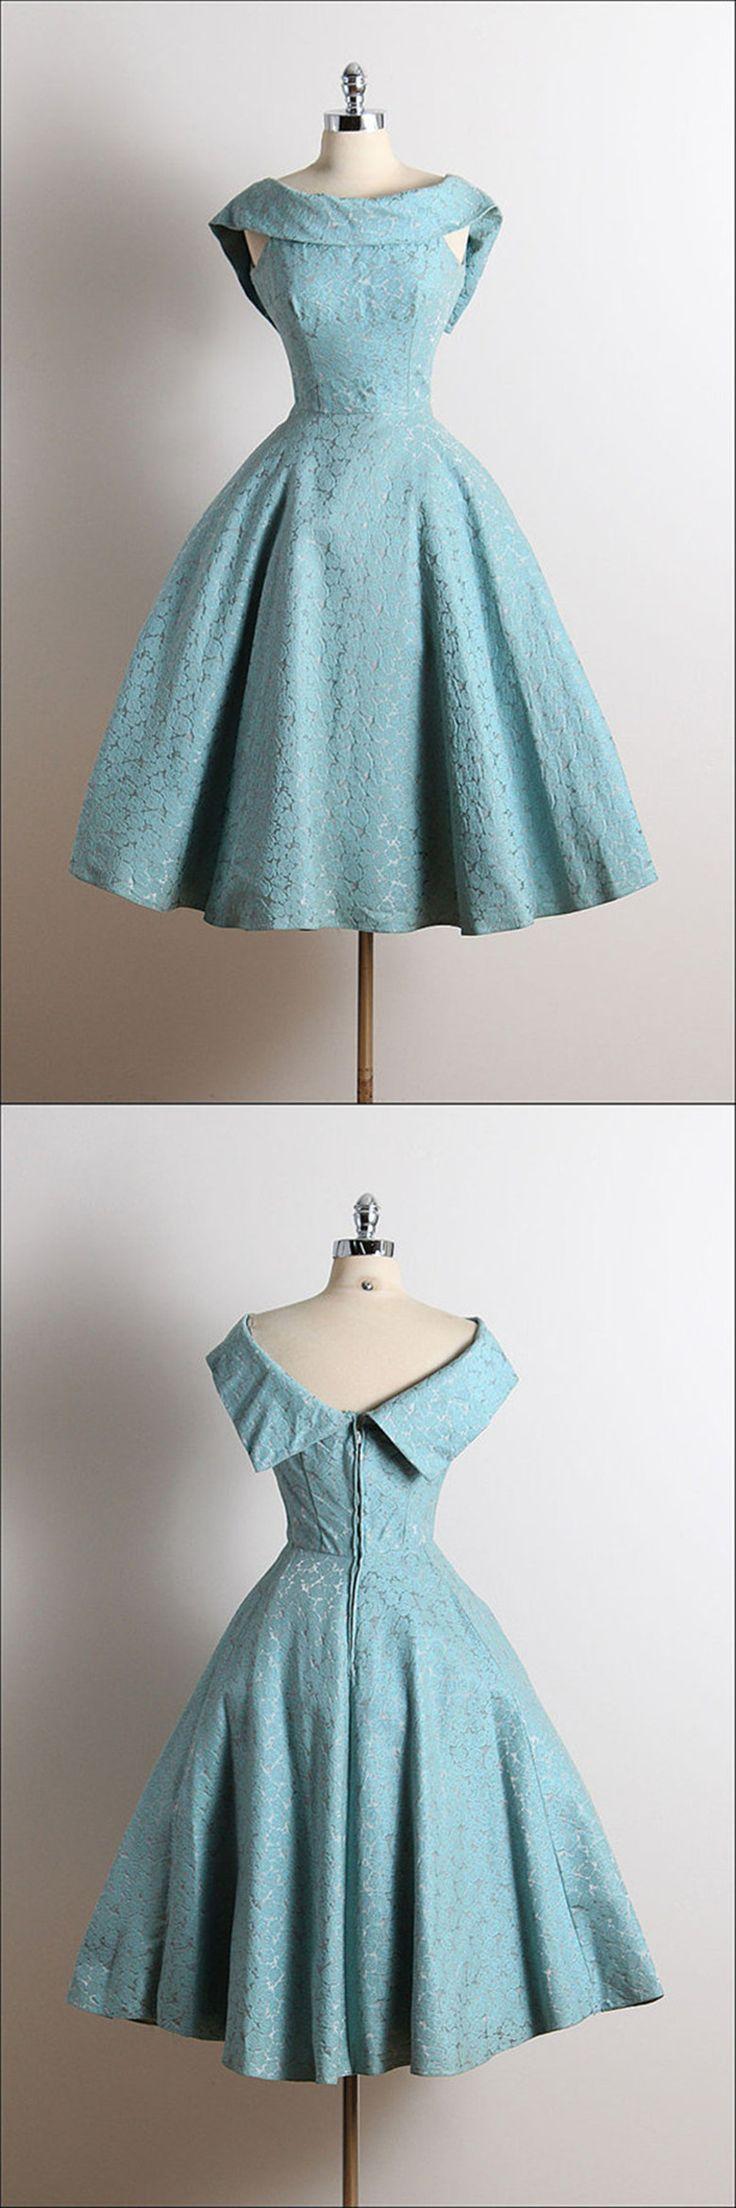 2016 homecoming dress,vintage homecoming dress,1950s homecoming dress,blue…